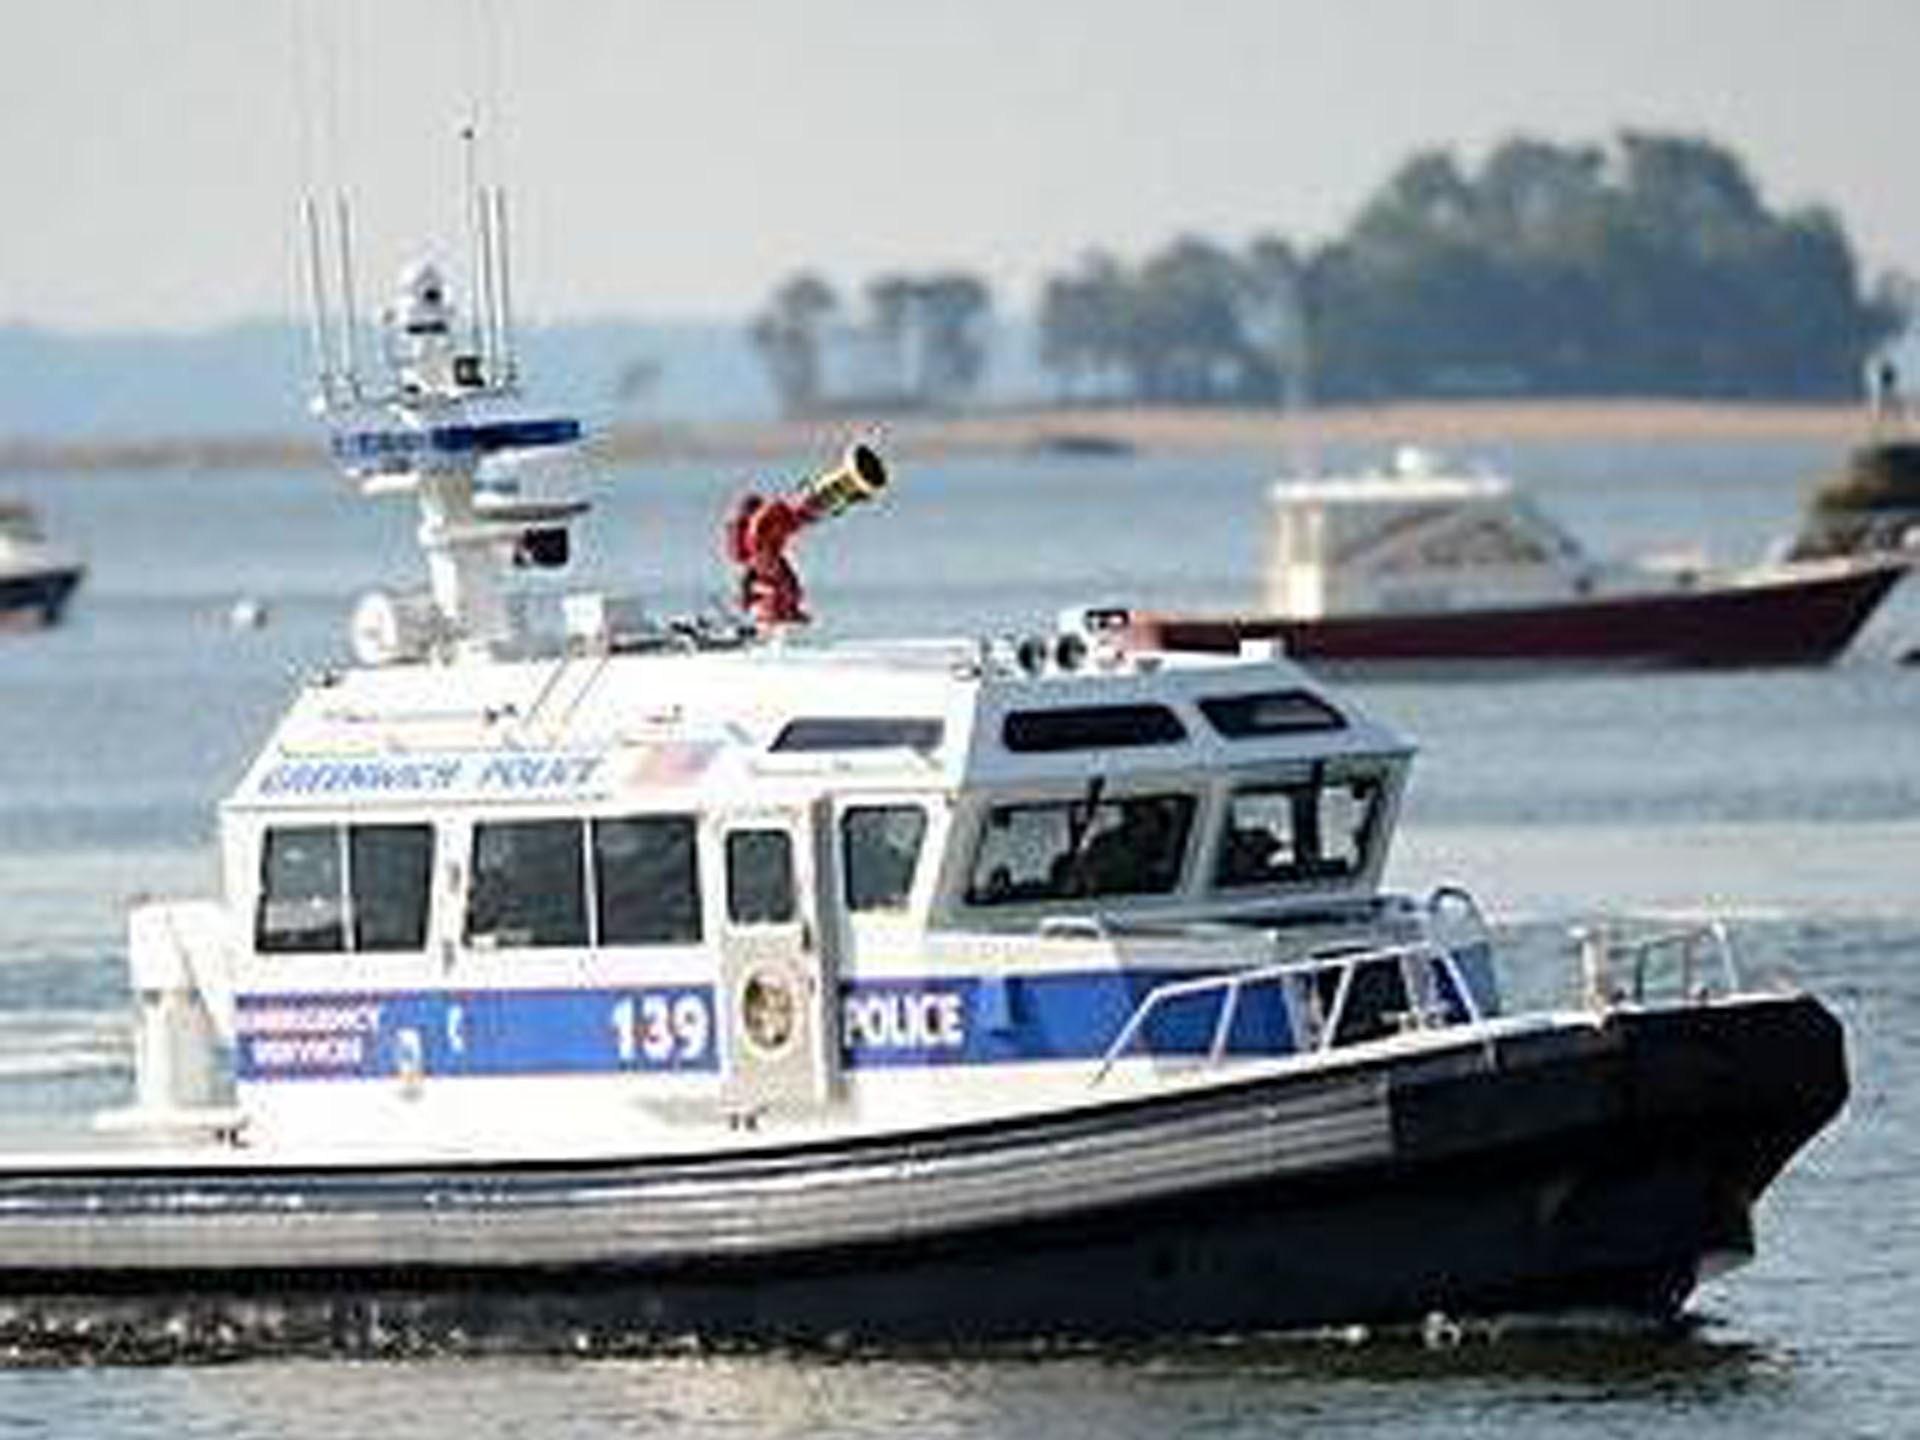 Greenwich police marine boat.jpg